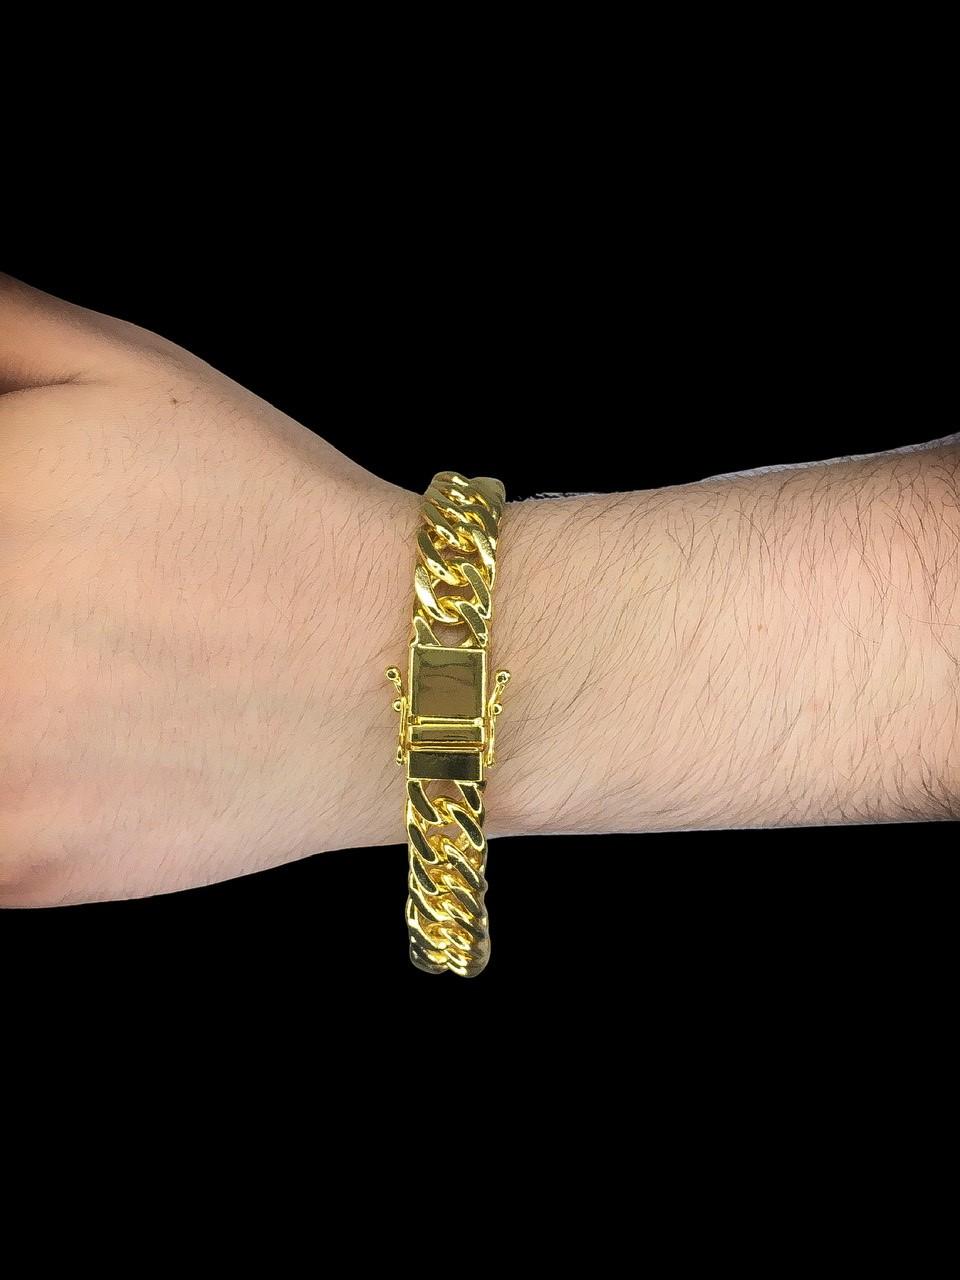 Pulseira Grumet dupla -  13 milímetros - 22 Centímetros - fecho gaveta trava dupla - Banhado a ouro 18 k